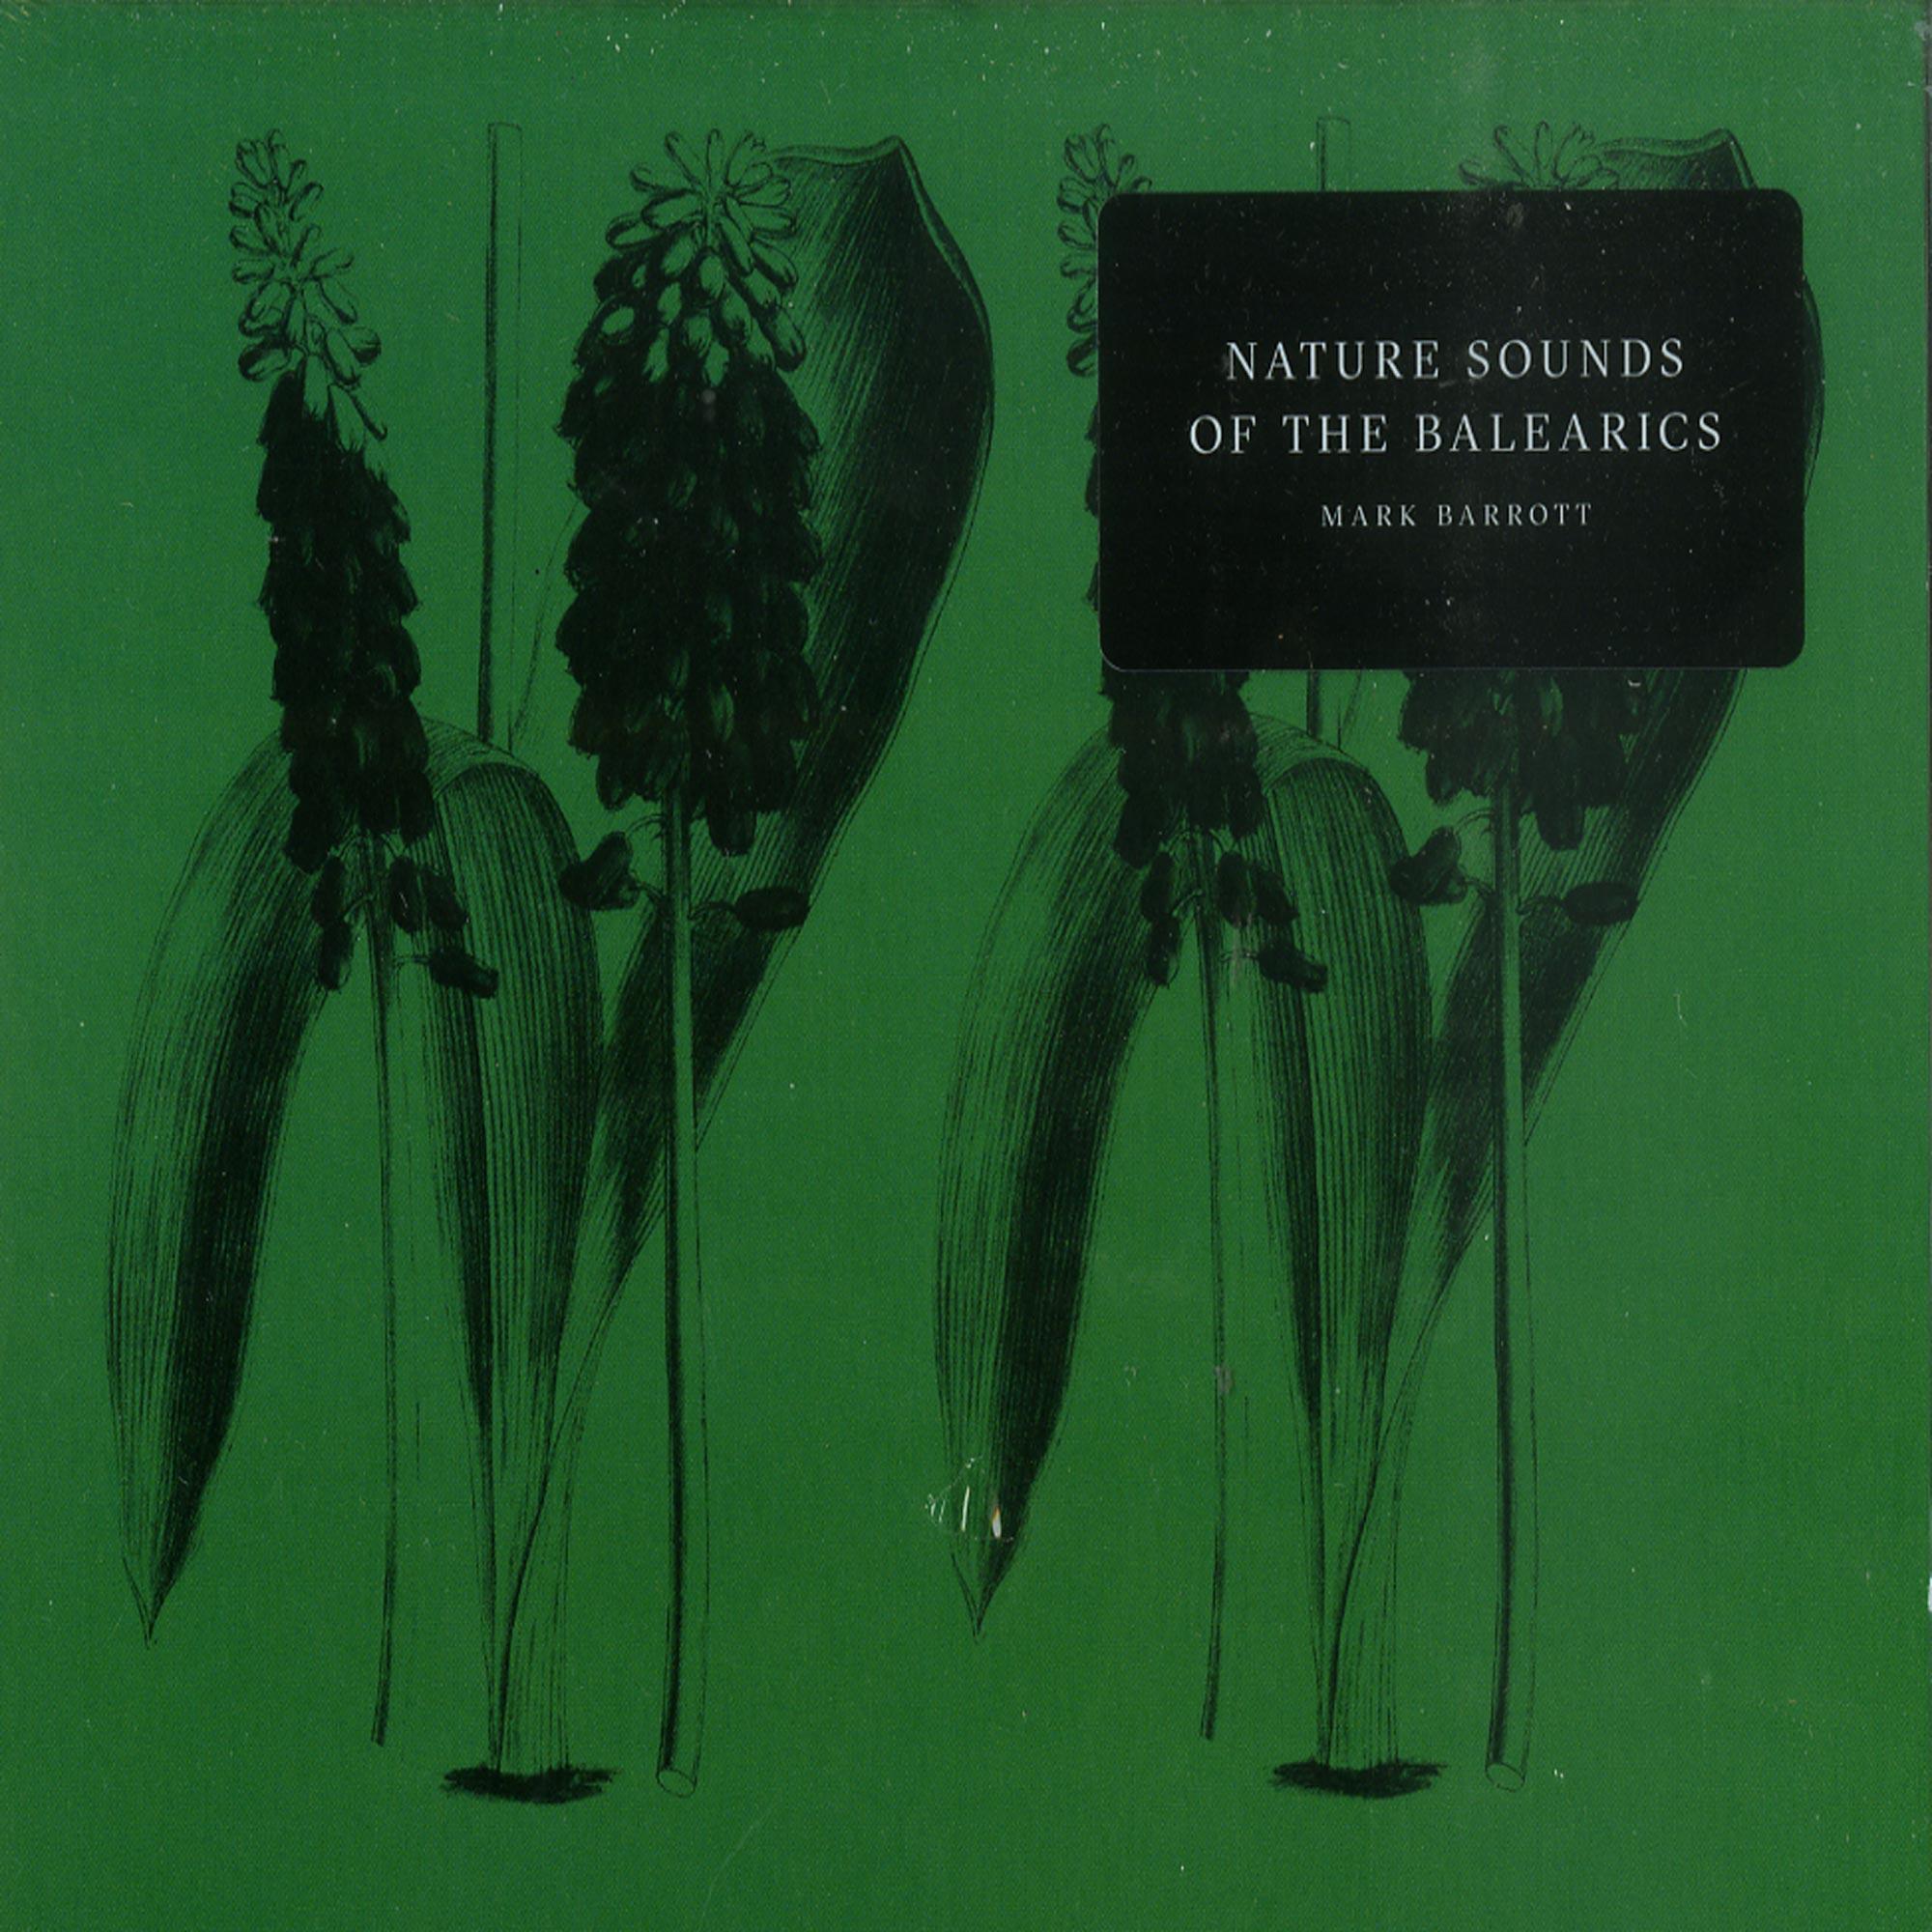 Mark Barrott - NATURE SOUNDS OF THE BALEARICS